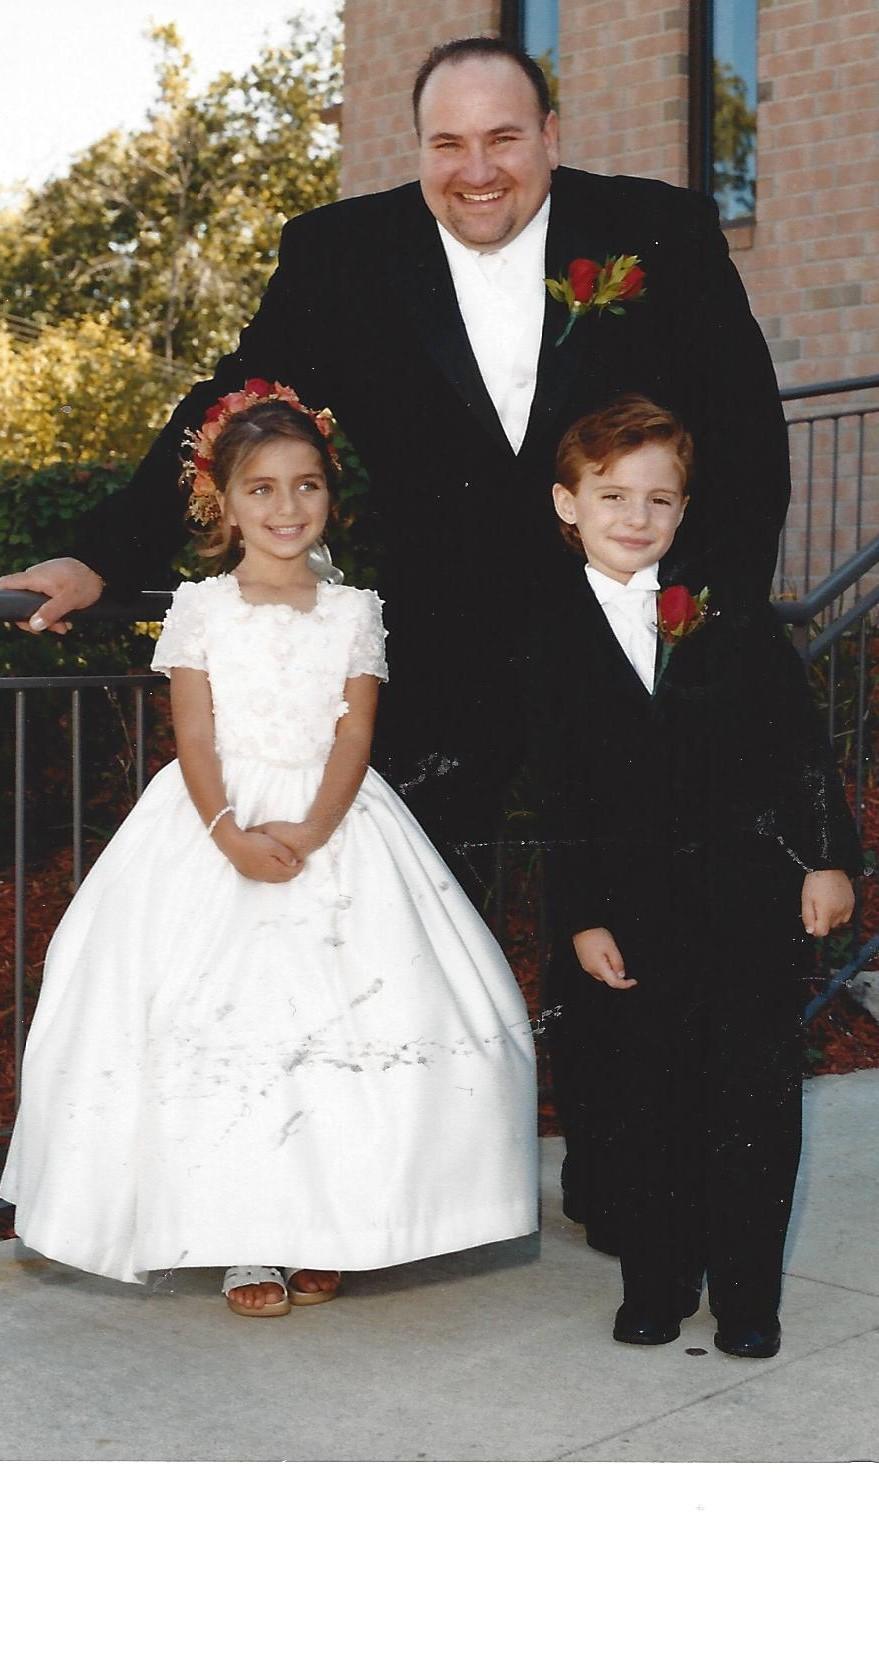 Rachael and Nicholas